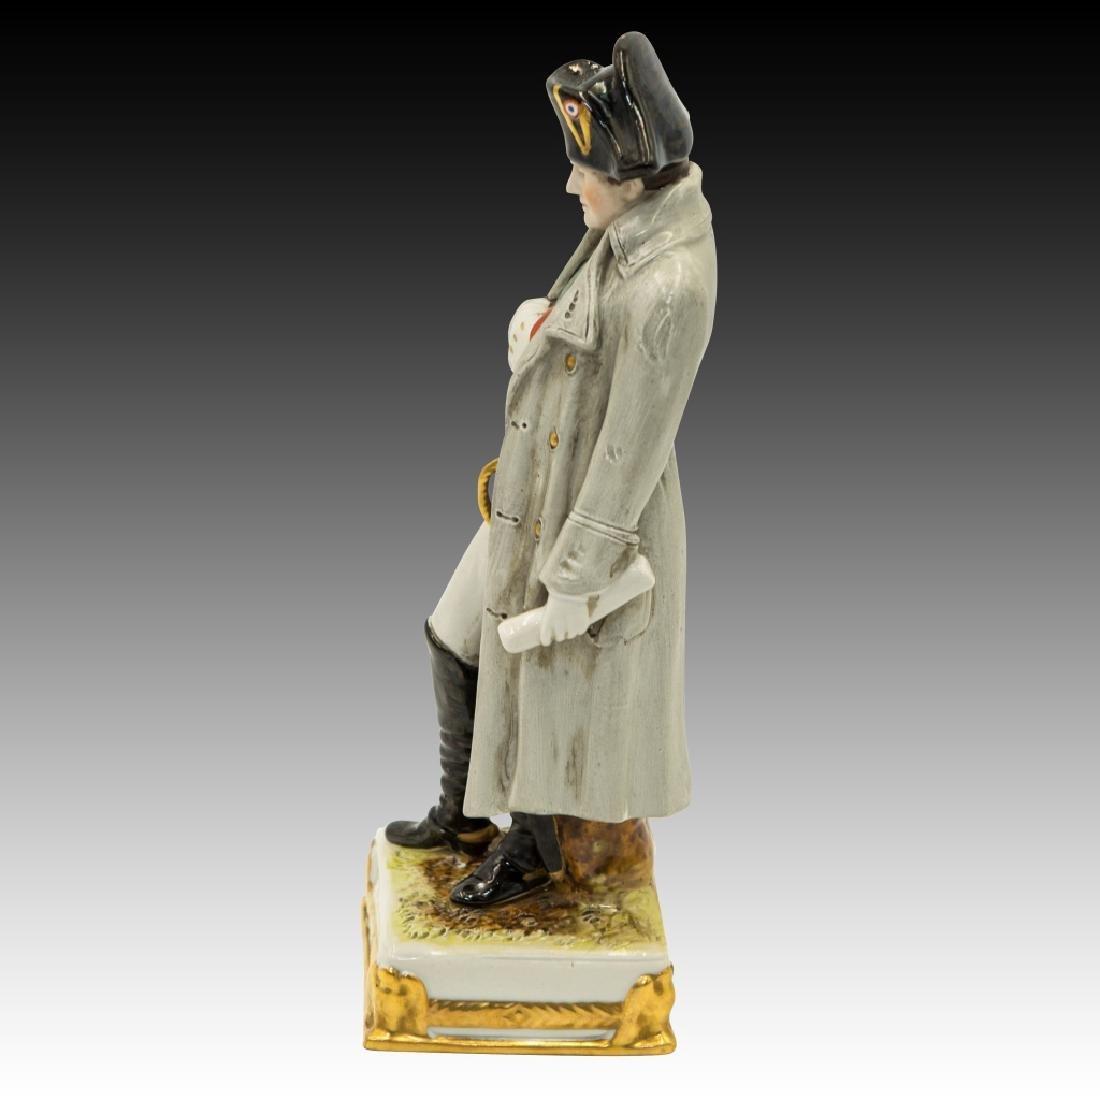 2 Figurines Napoleon and Ticouette - 7